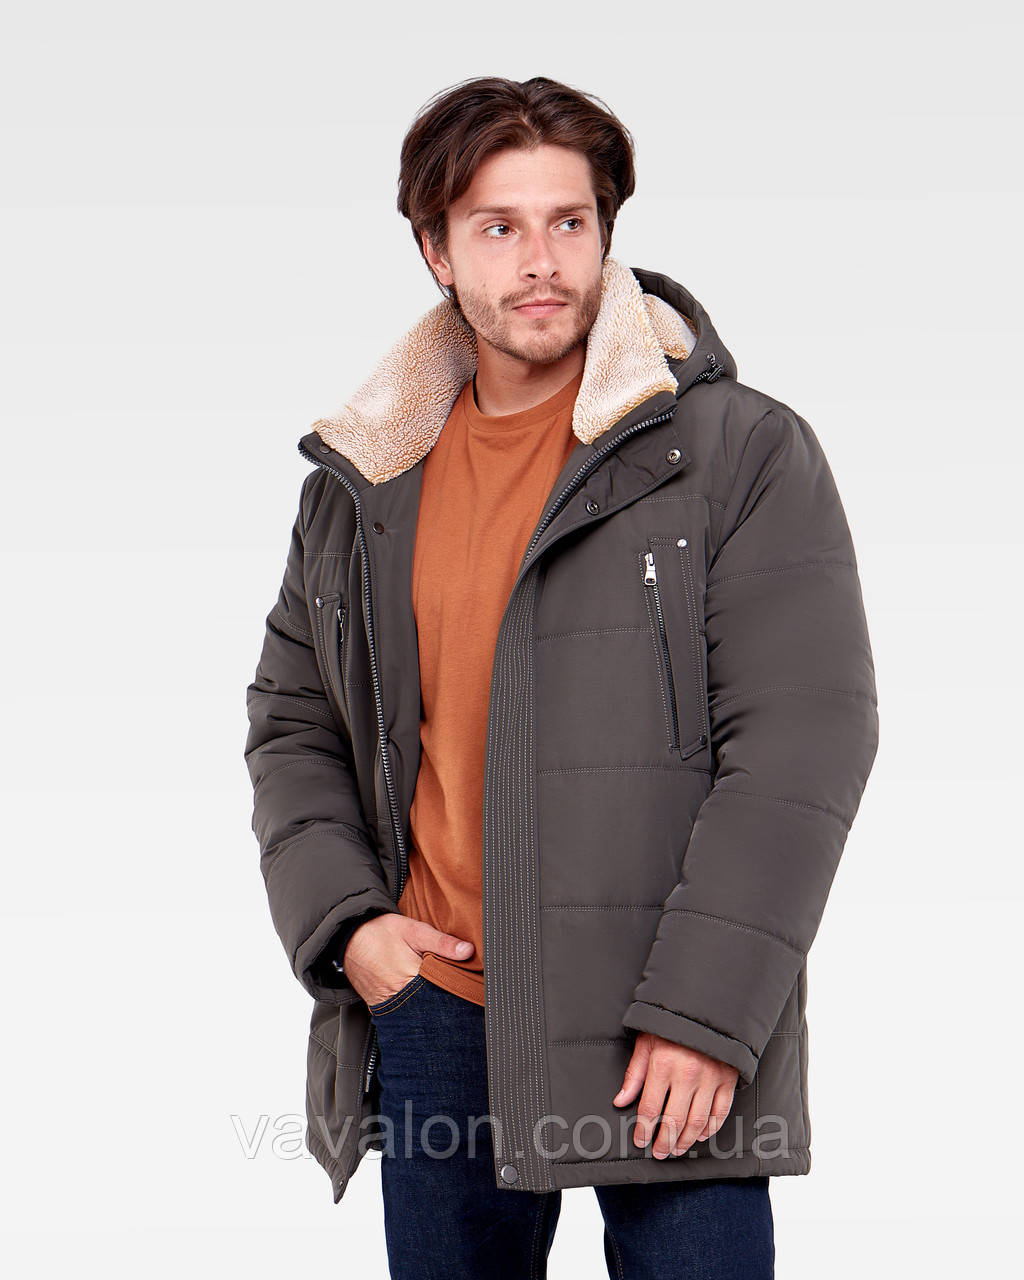 Зимняя мужская куртка Vavalon KZ-938 khaki